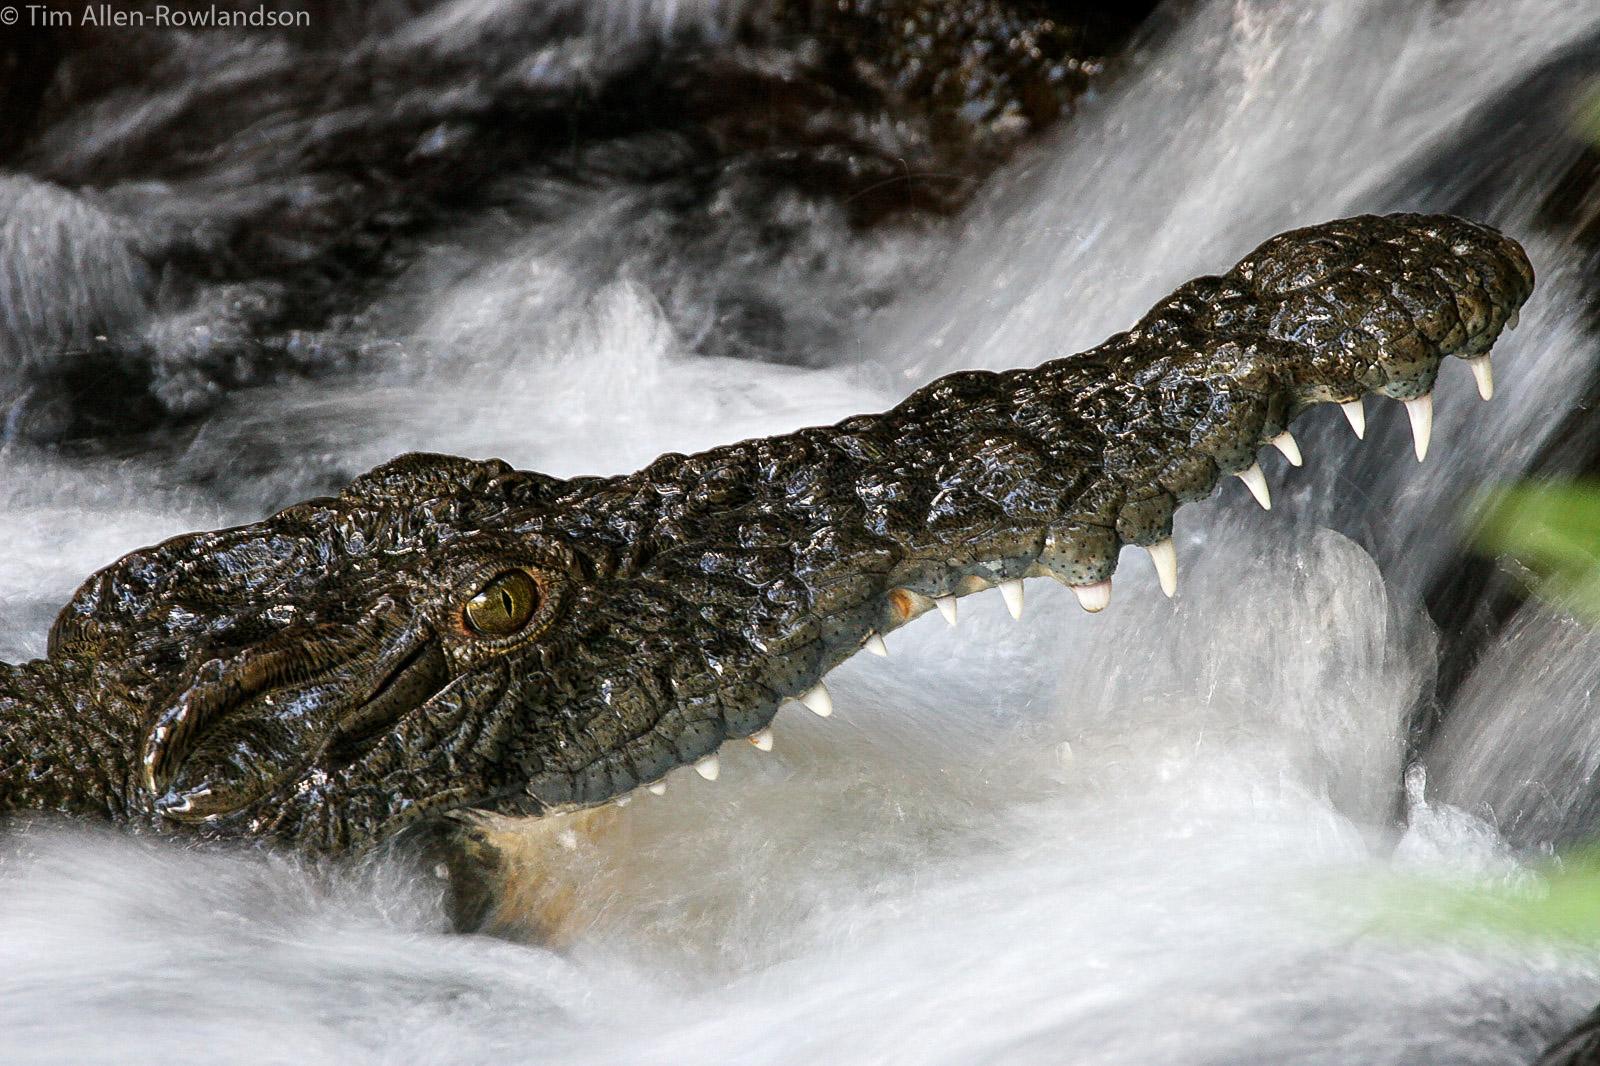 Crocodile fishing in a stream, Tsavo